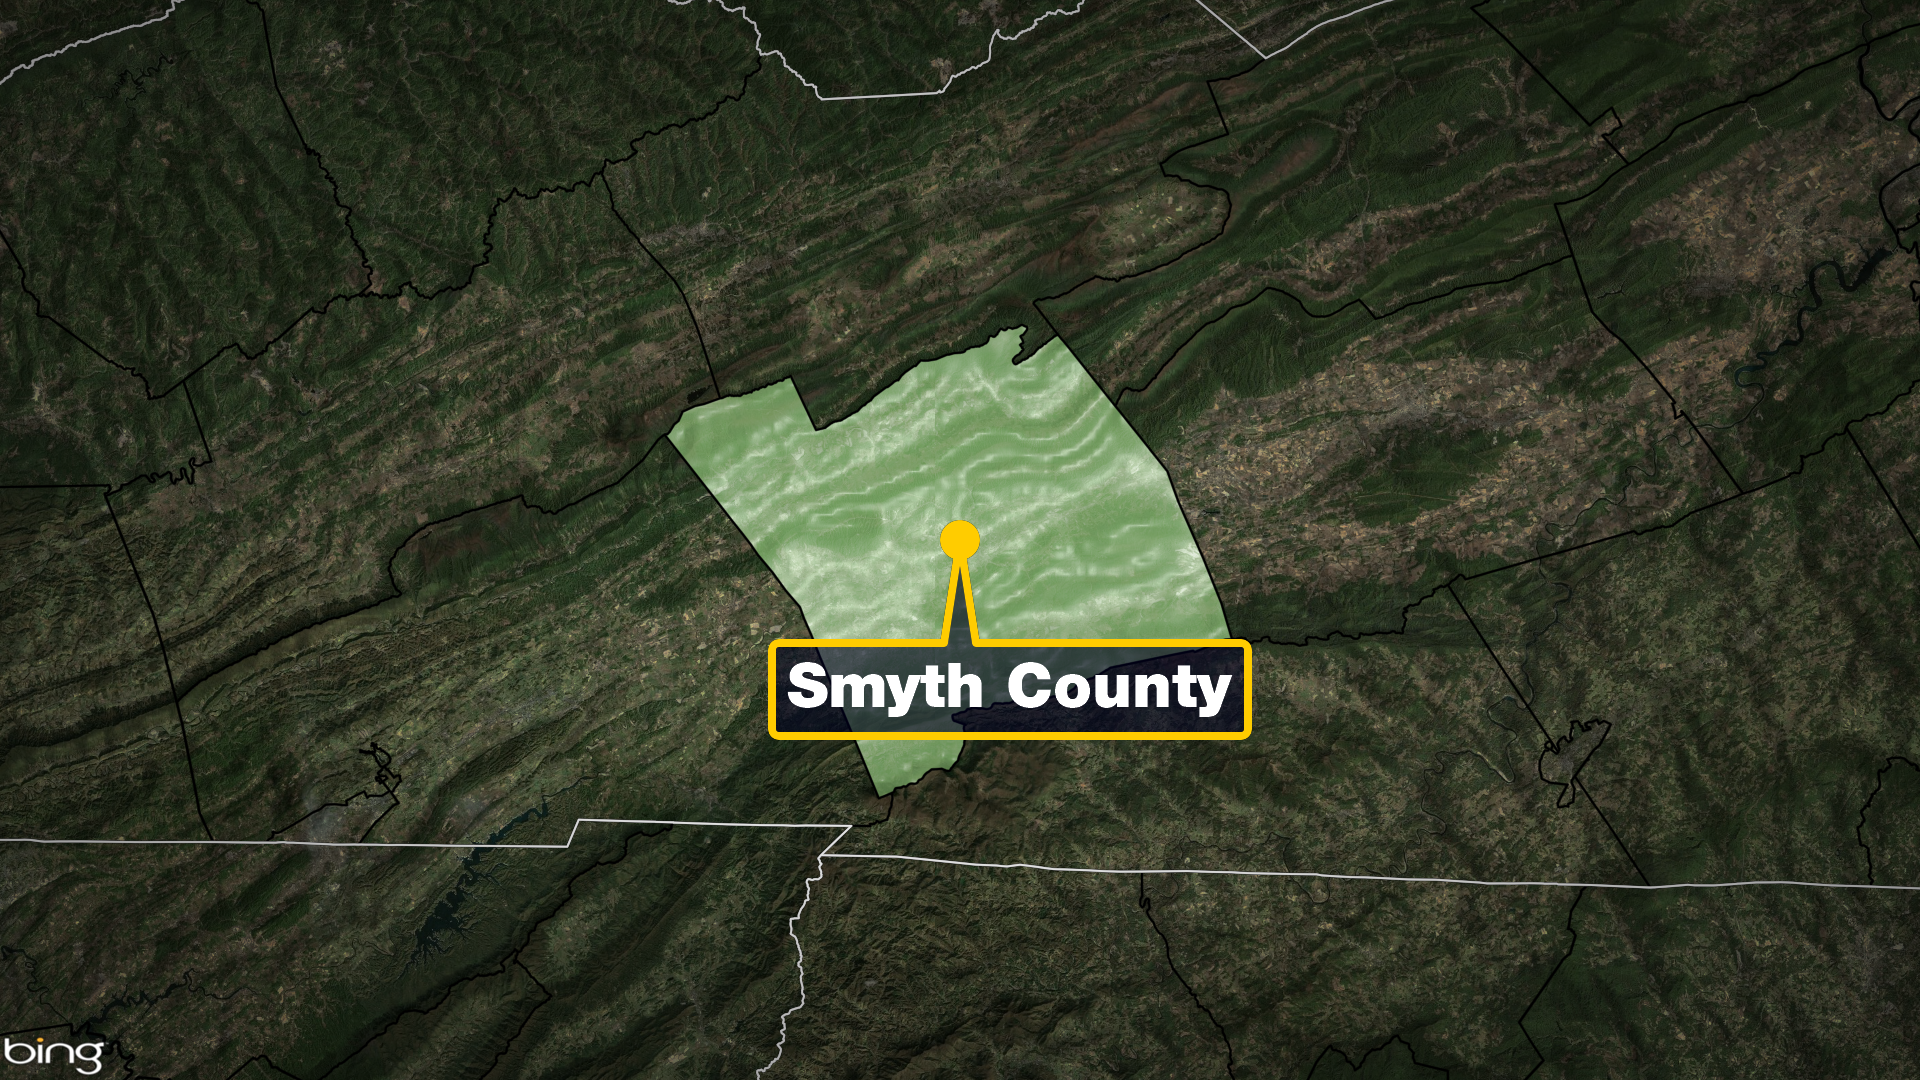 Smyth County 2_1548197409474.png.jpg